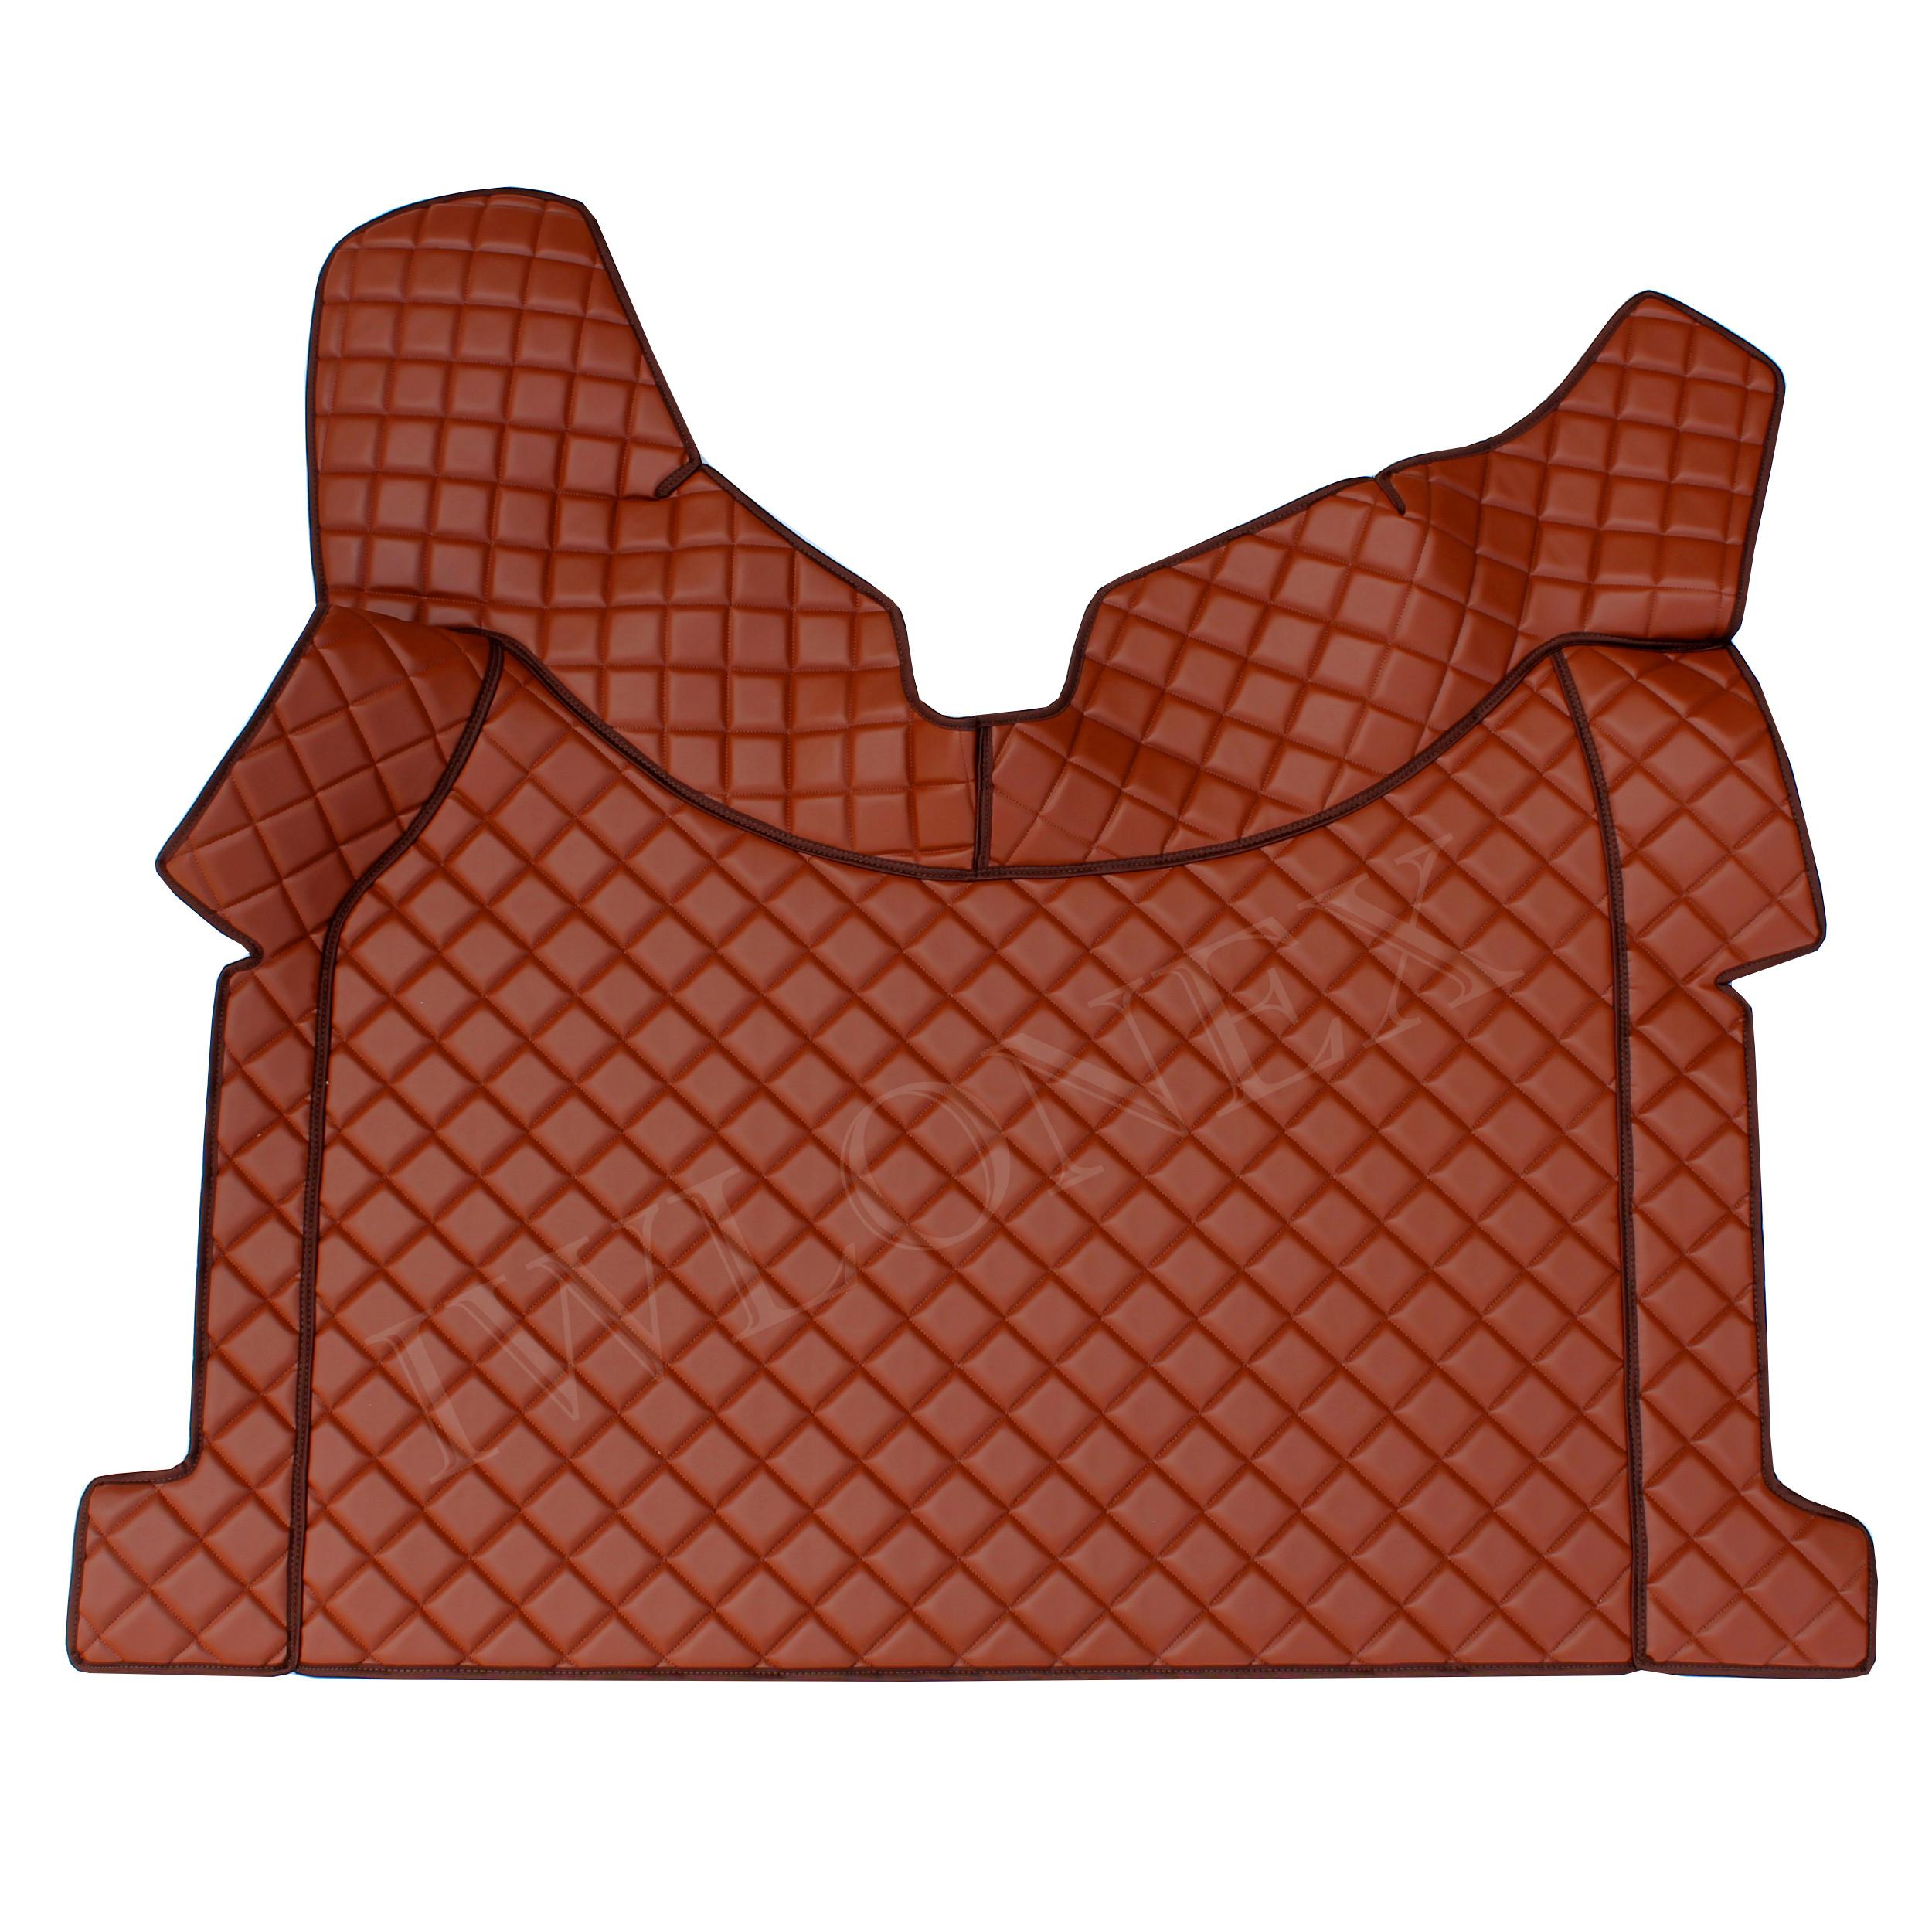 fu matten sitzsockelverkleidung t rverkleidung passend f r. Black Bedroom Furniture Sets. Home Design Ideas